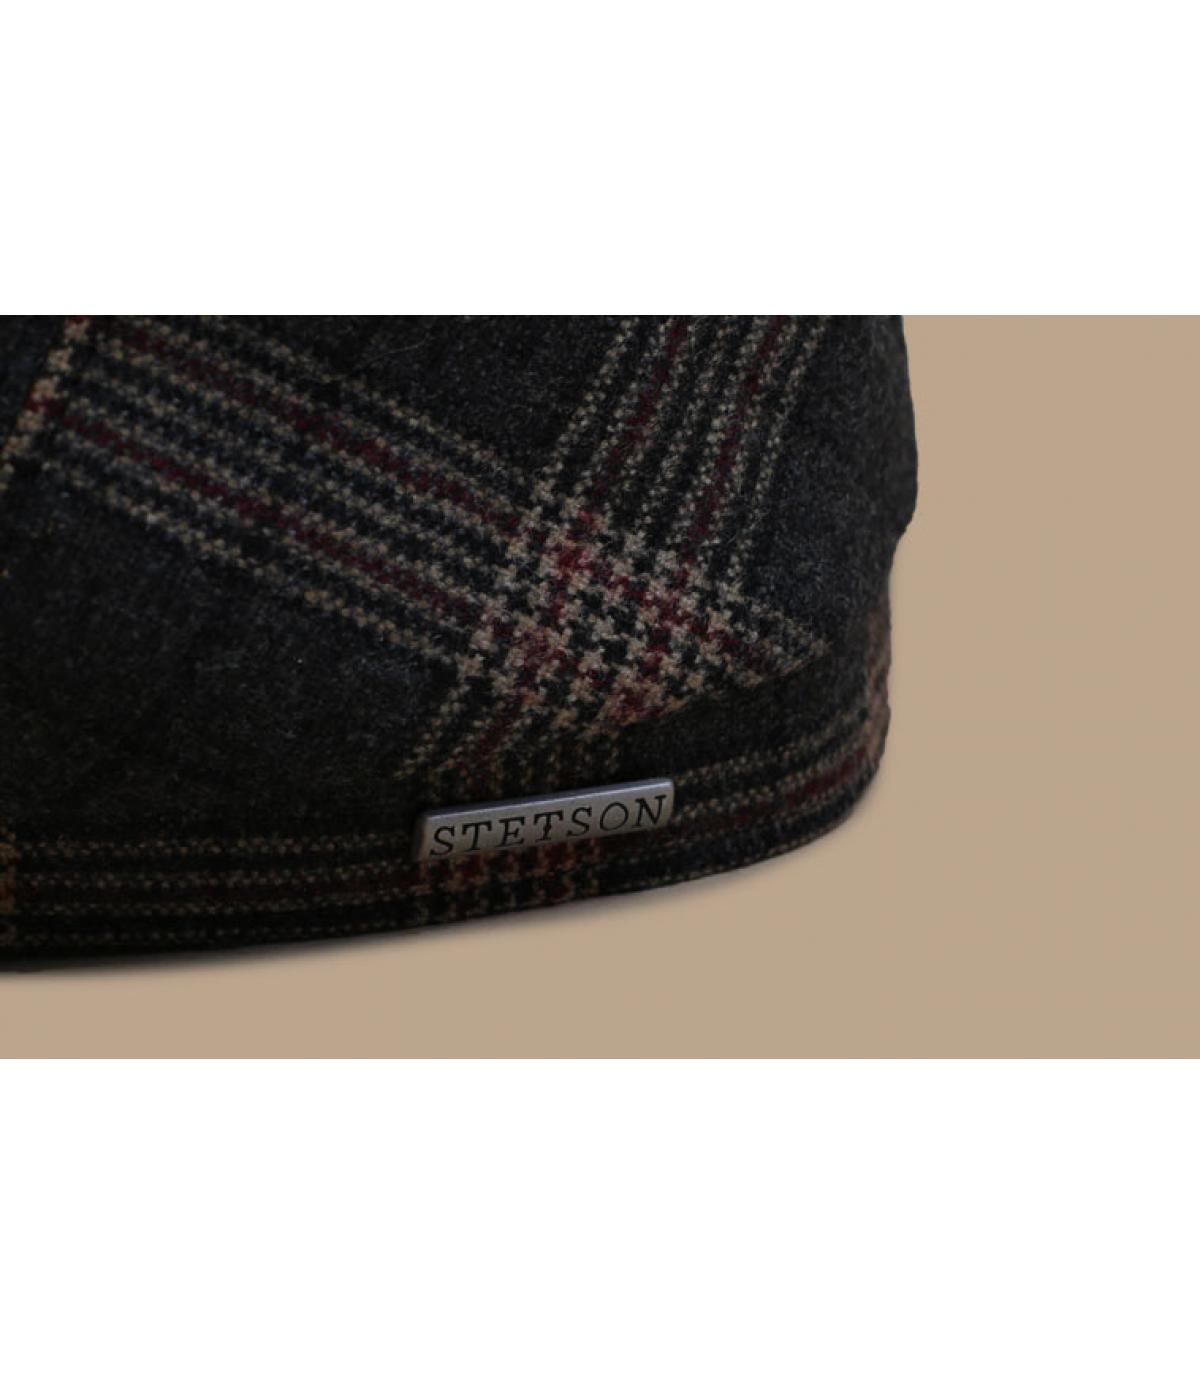 Details 6-Panel Cap Wool Check grey brown - Abbildung 3